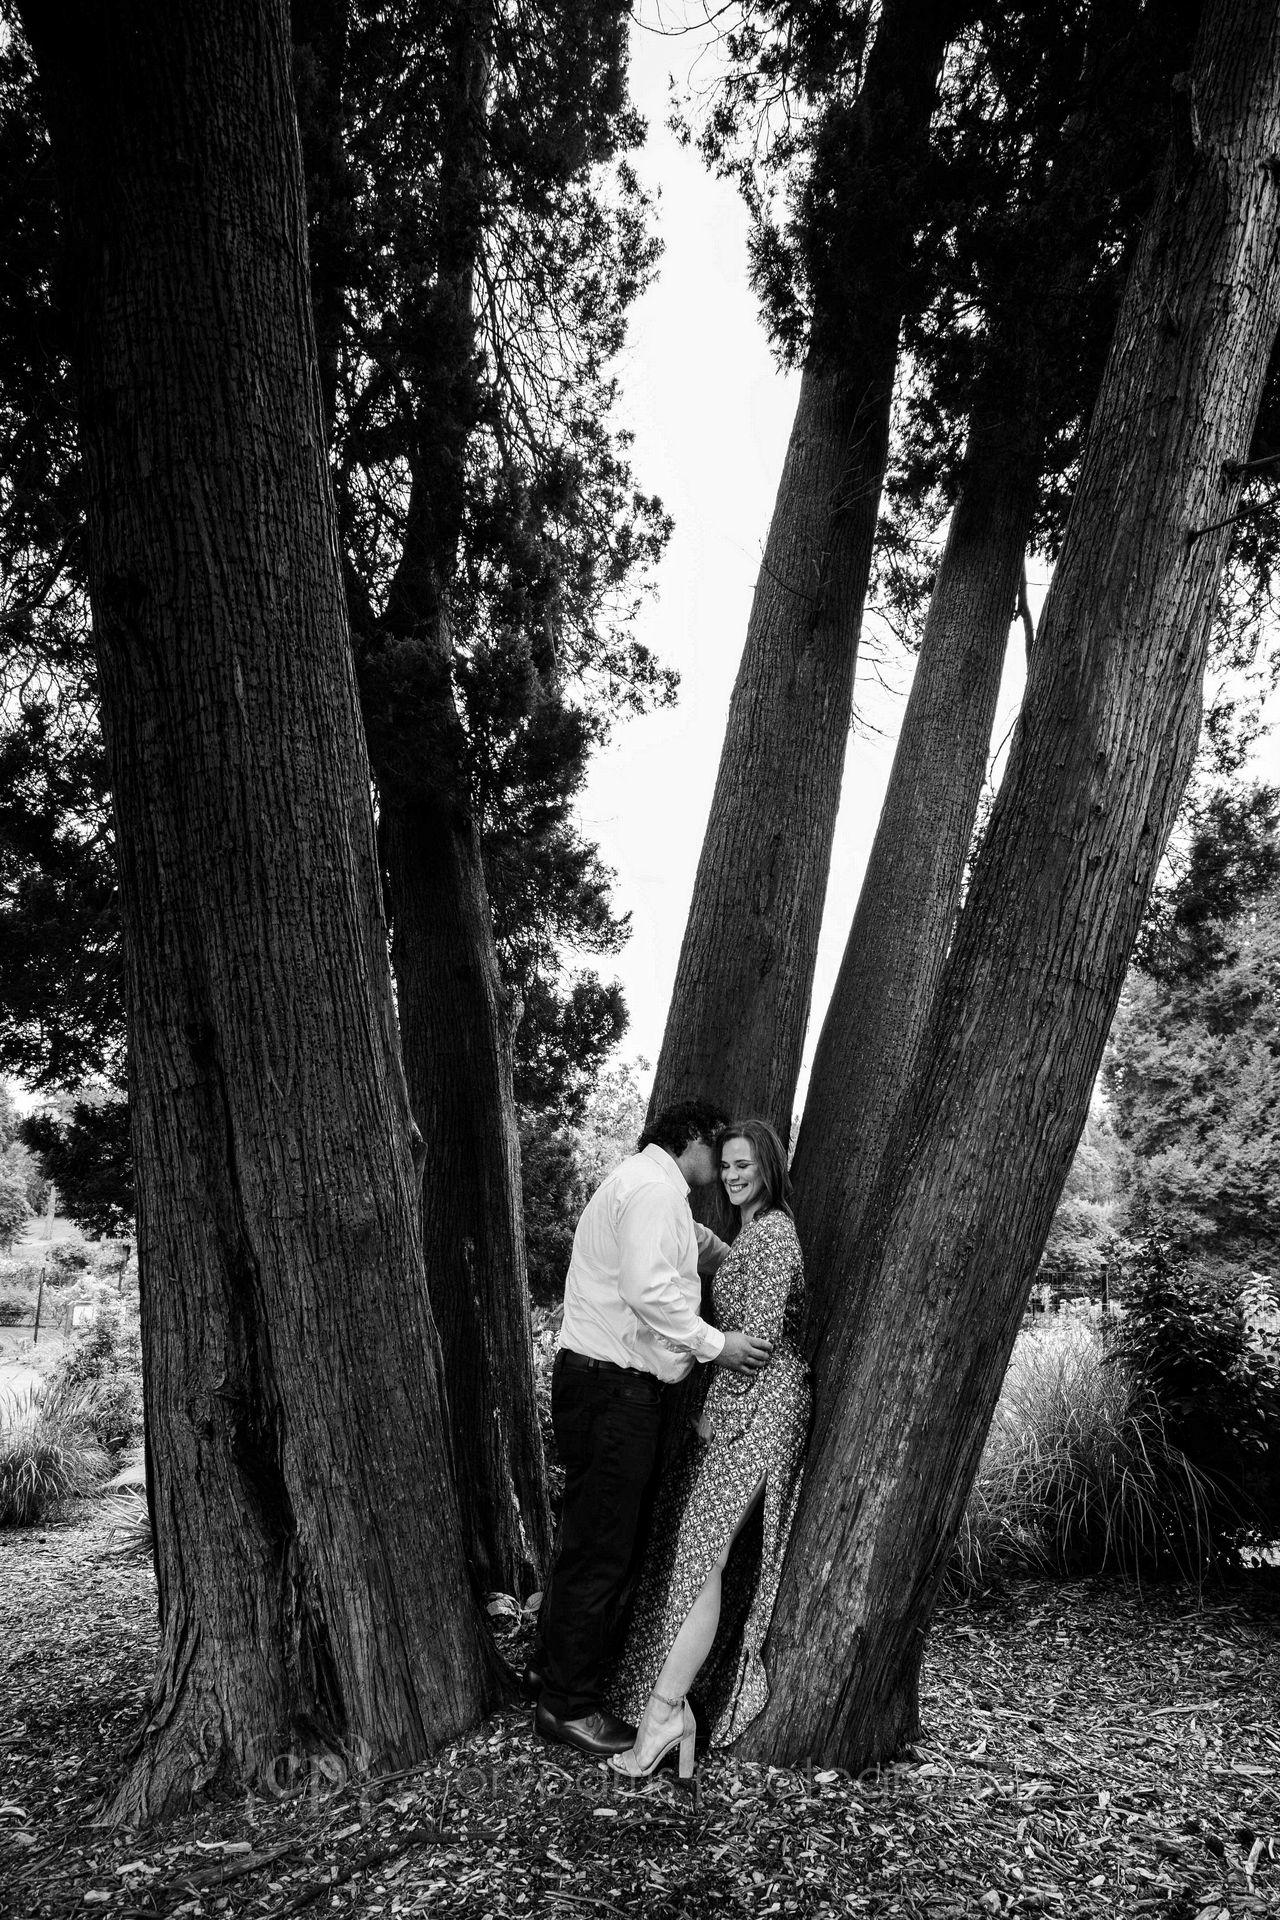 024-Tacoma-Engagement-Portraits.jpg